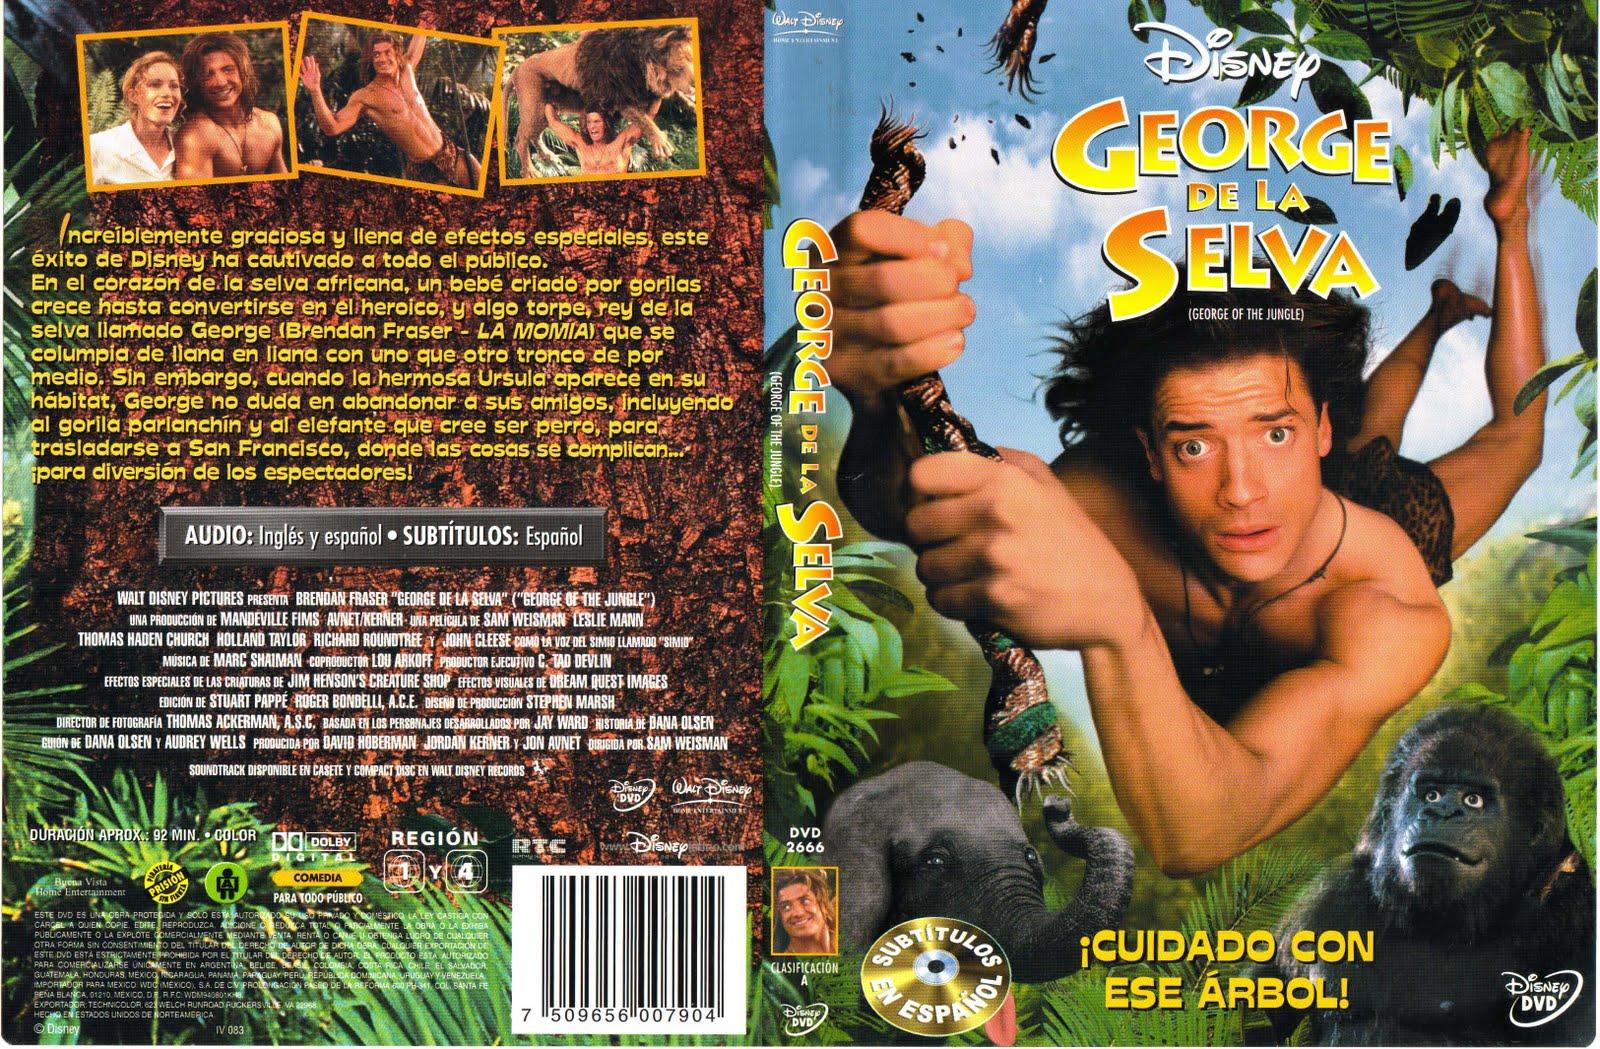 George of the jungle 1997 dvd images - Tarzan pelicula completa ...